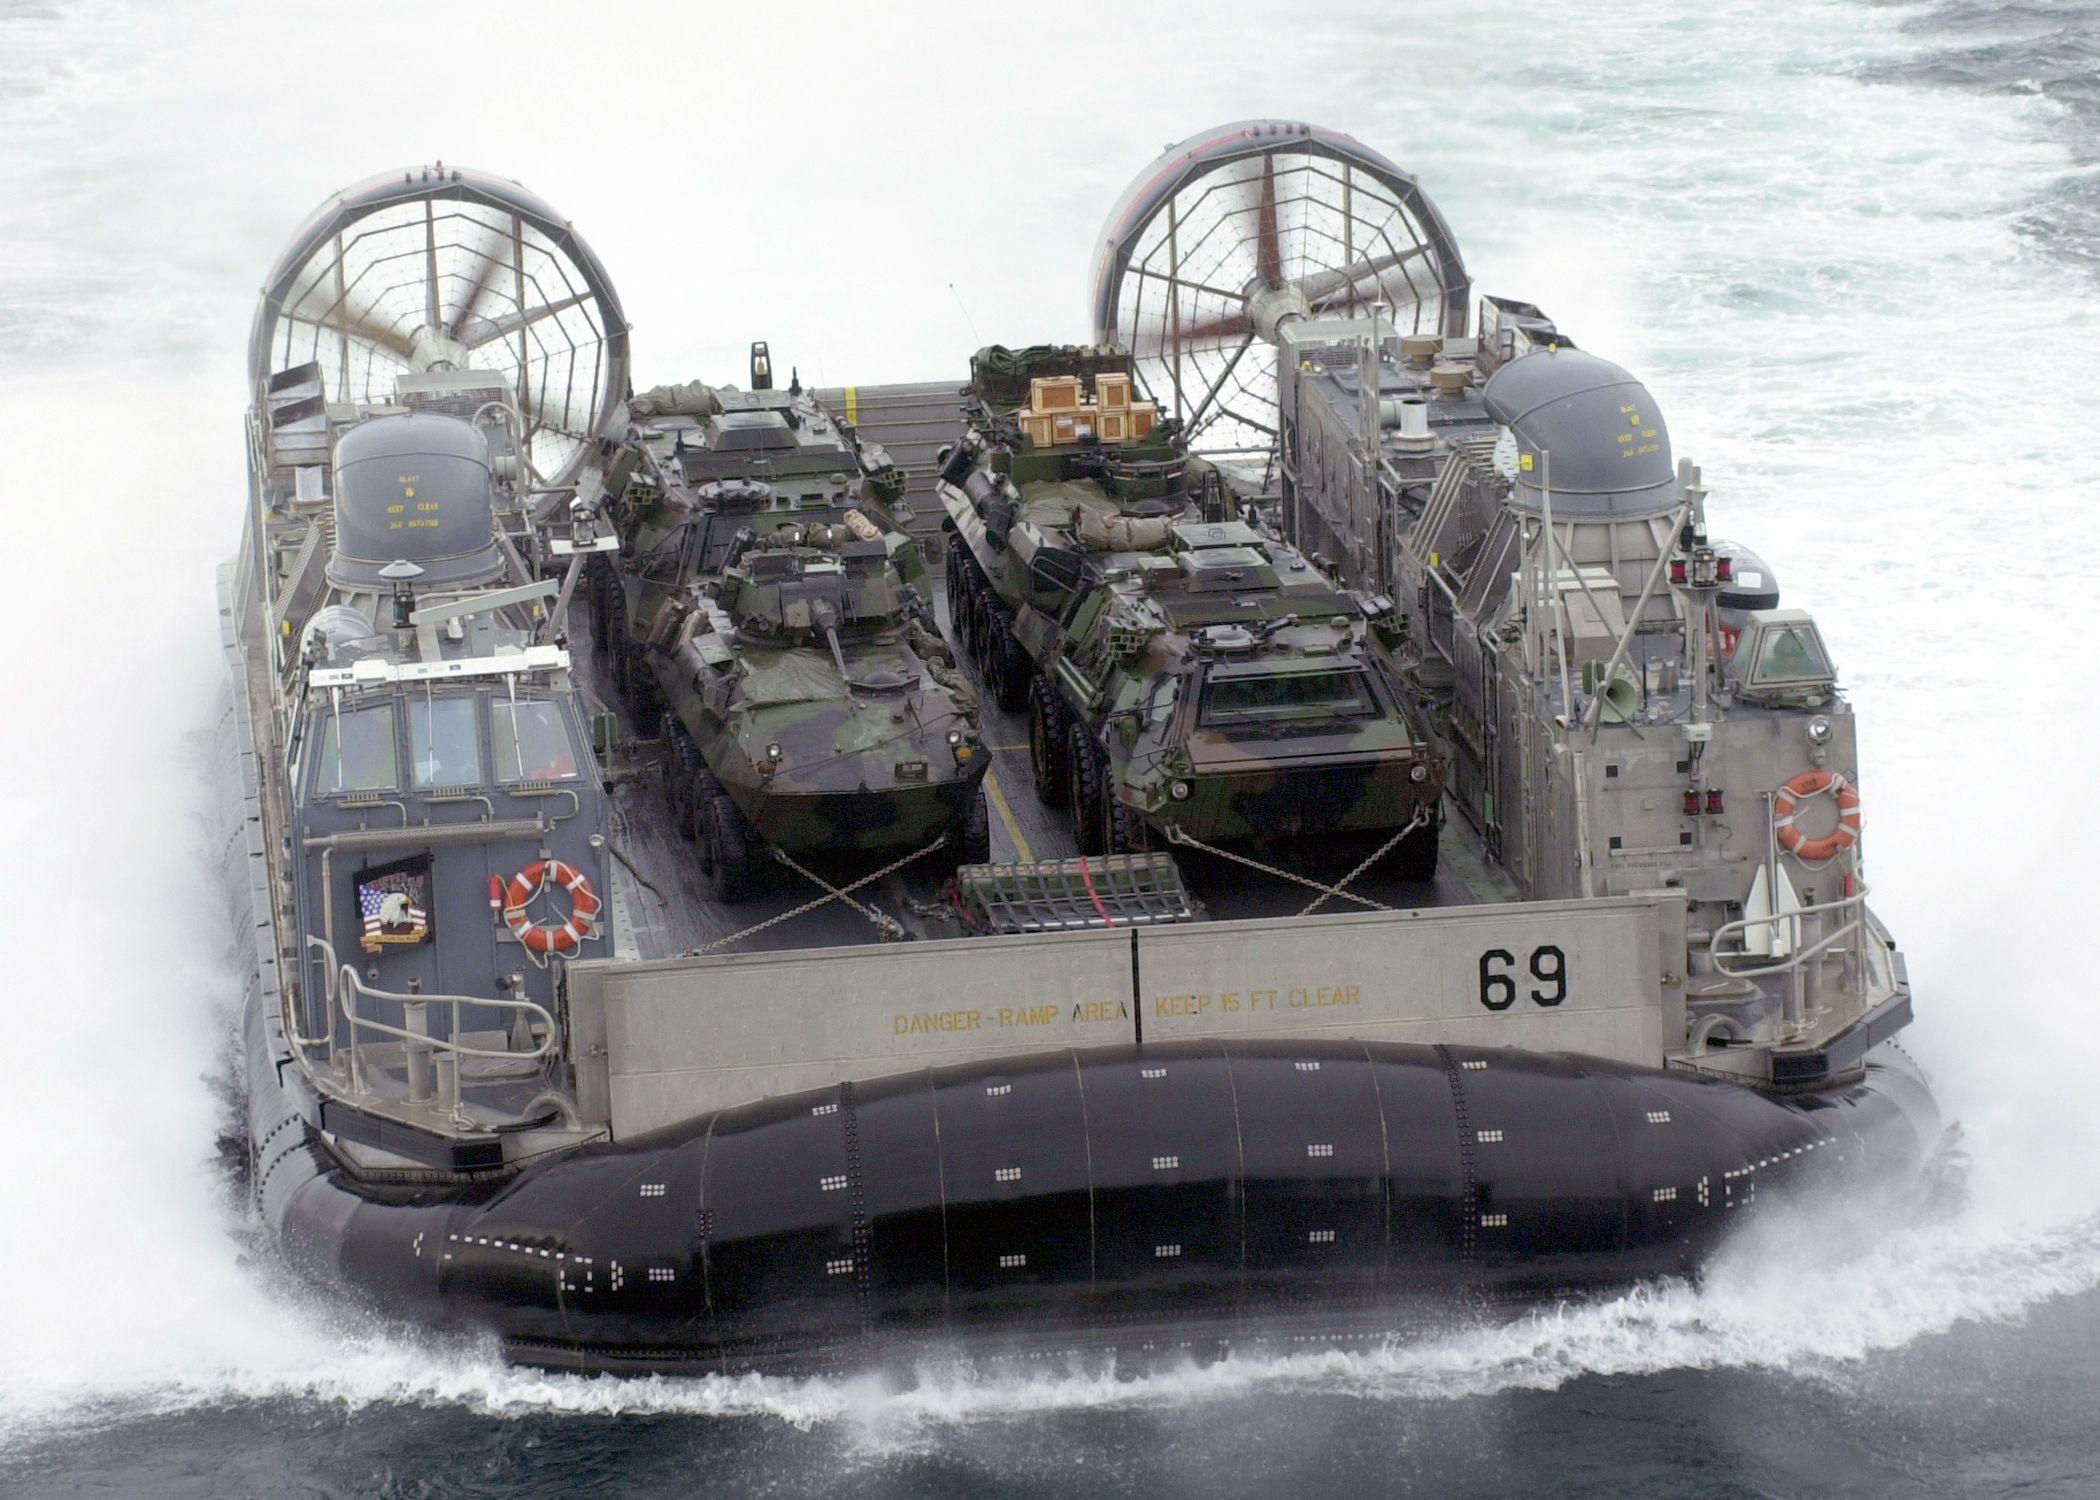 us navy 030113 n 2972r 114 a landing craft air cushion lcac vehicle